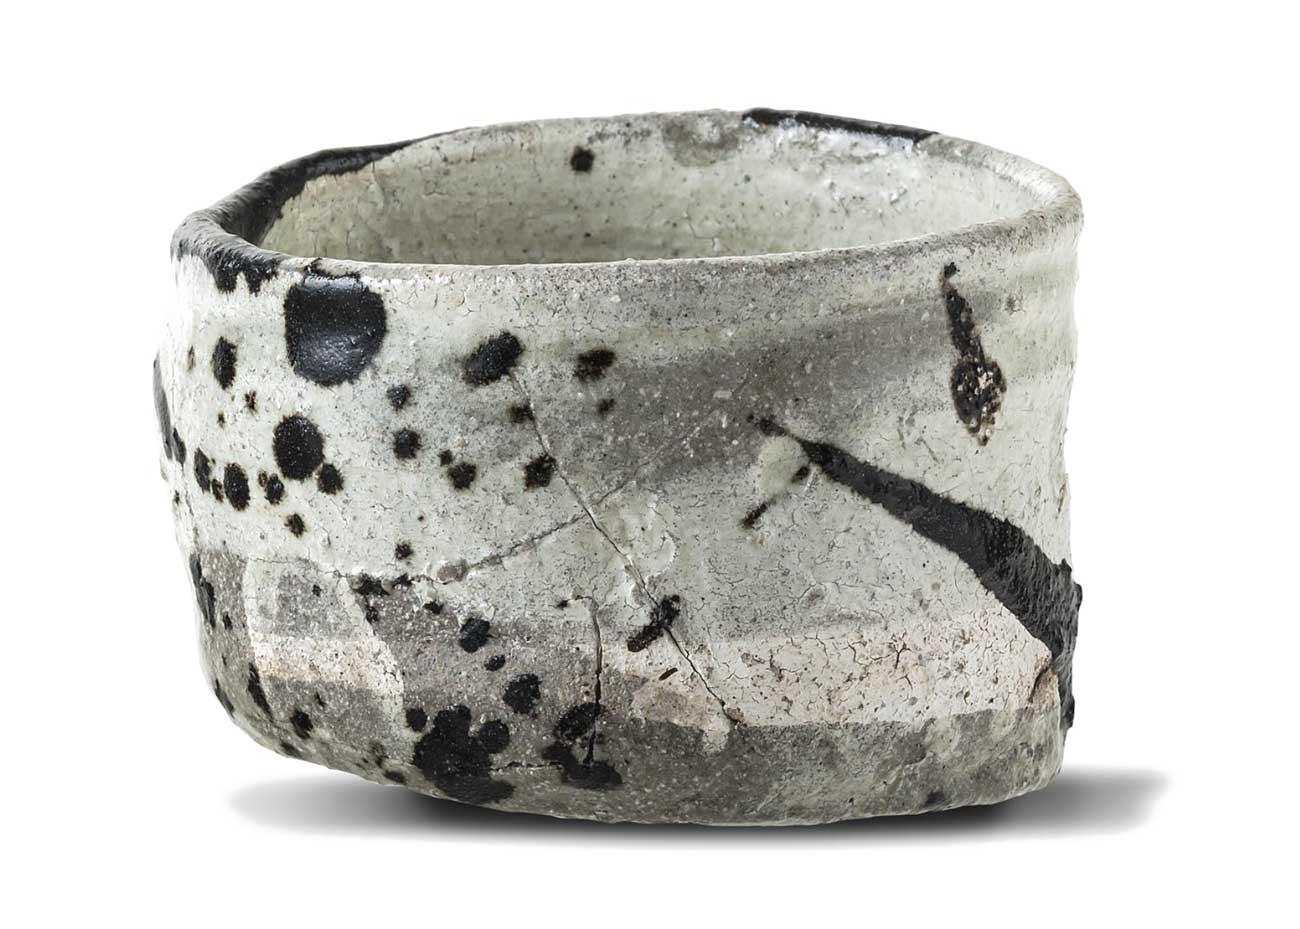 © Ryoji Koie, Ceramic Tea Bowl